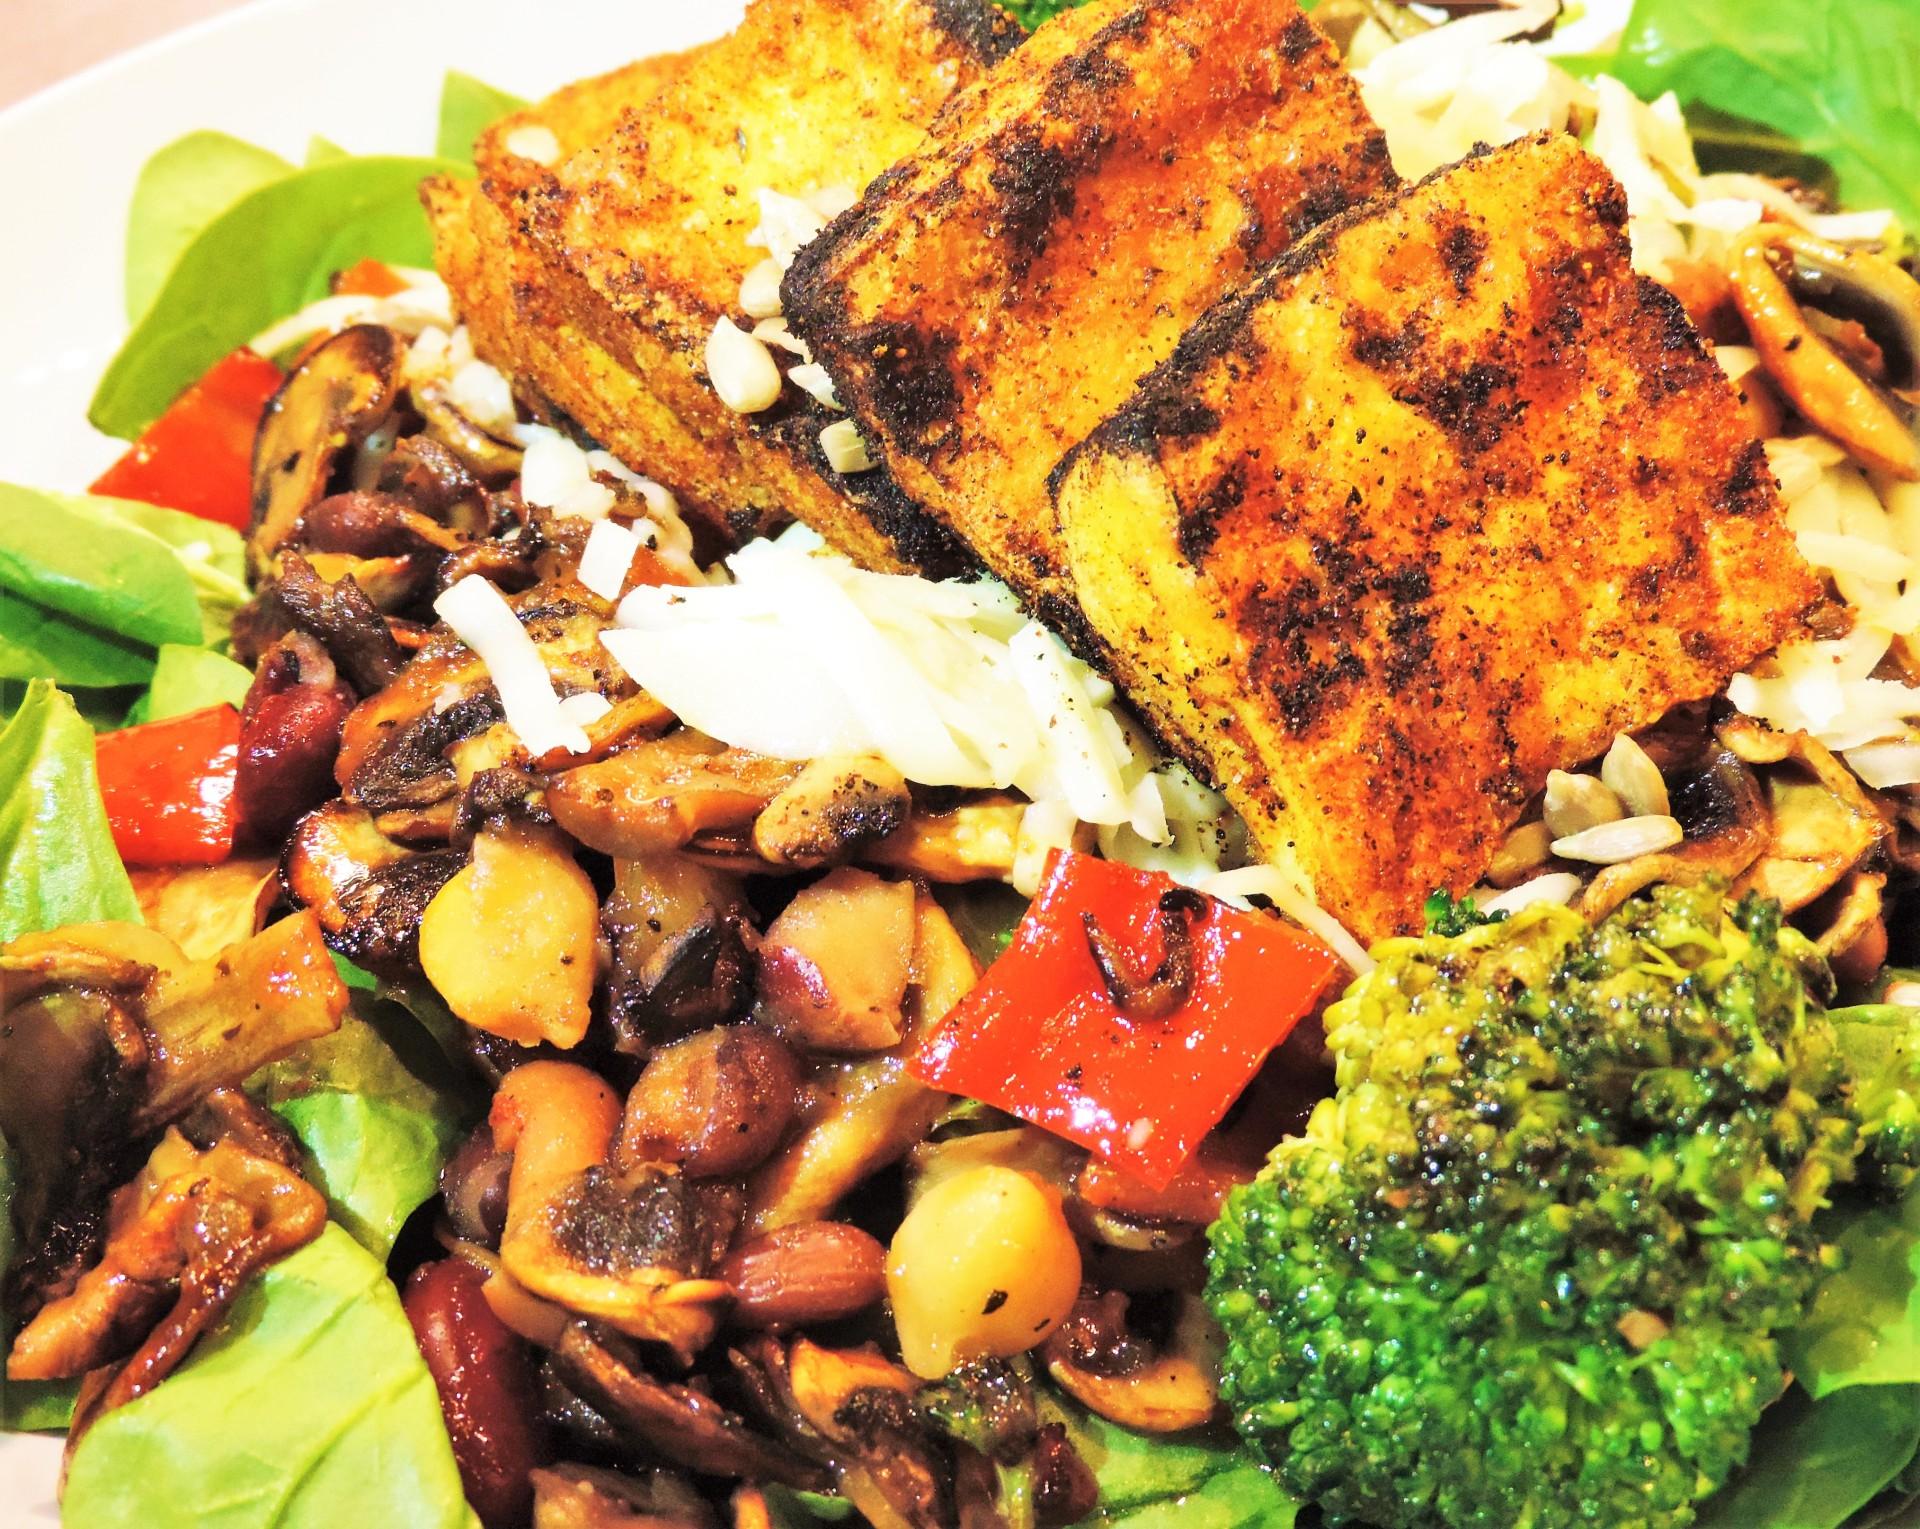 The Brazilian (Salad)